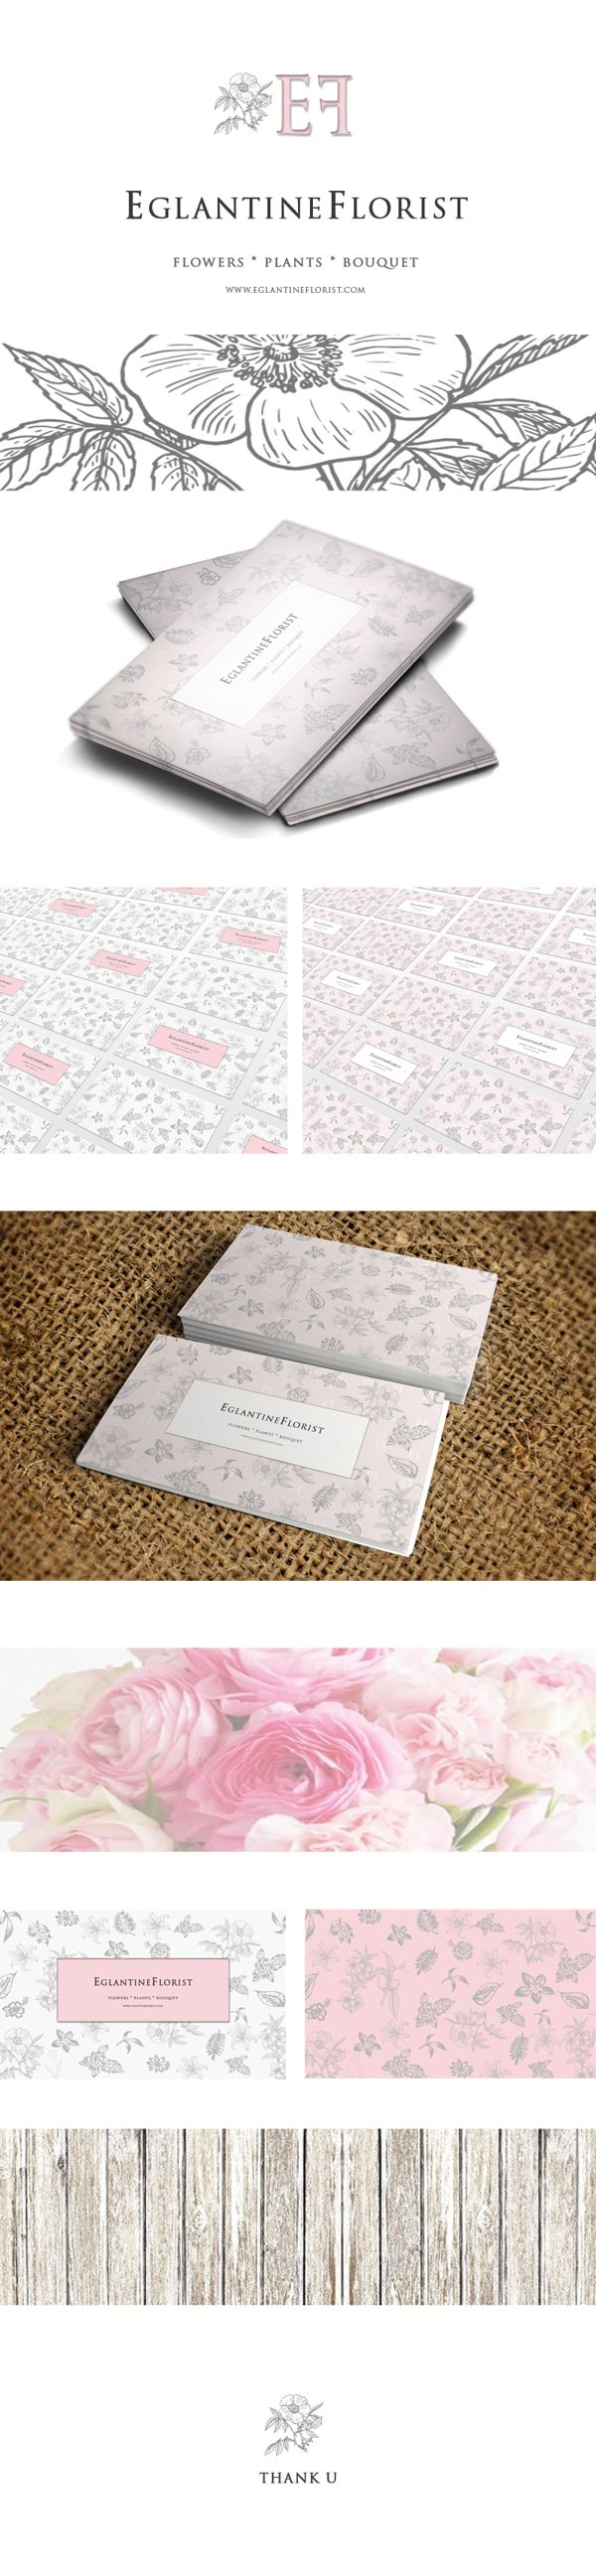 Eglantine Florist business card on Behance